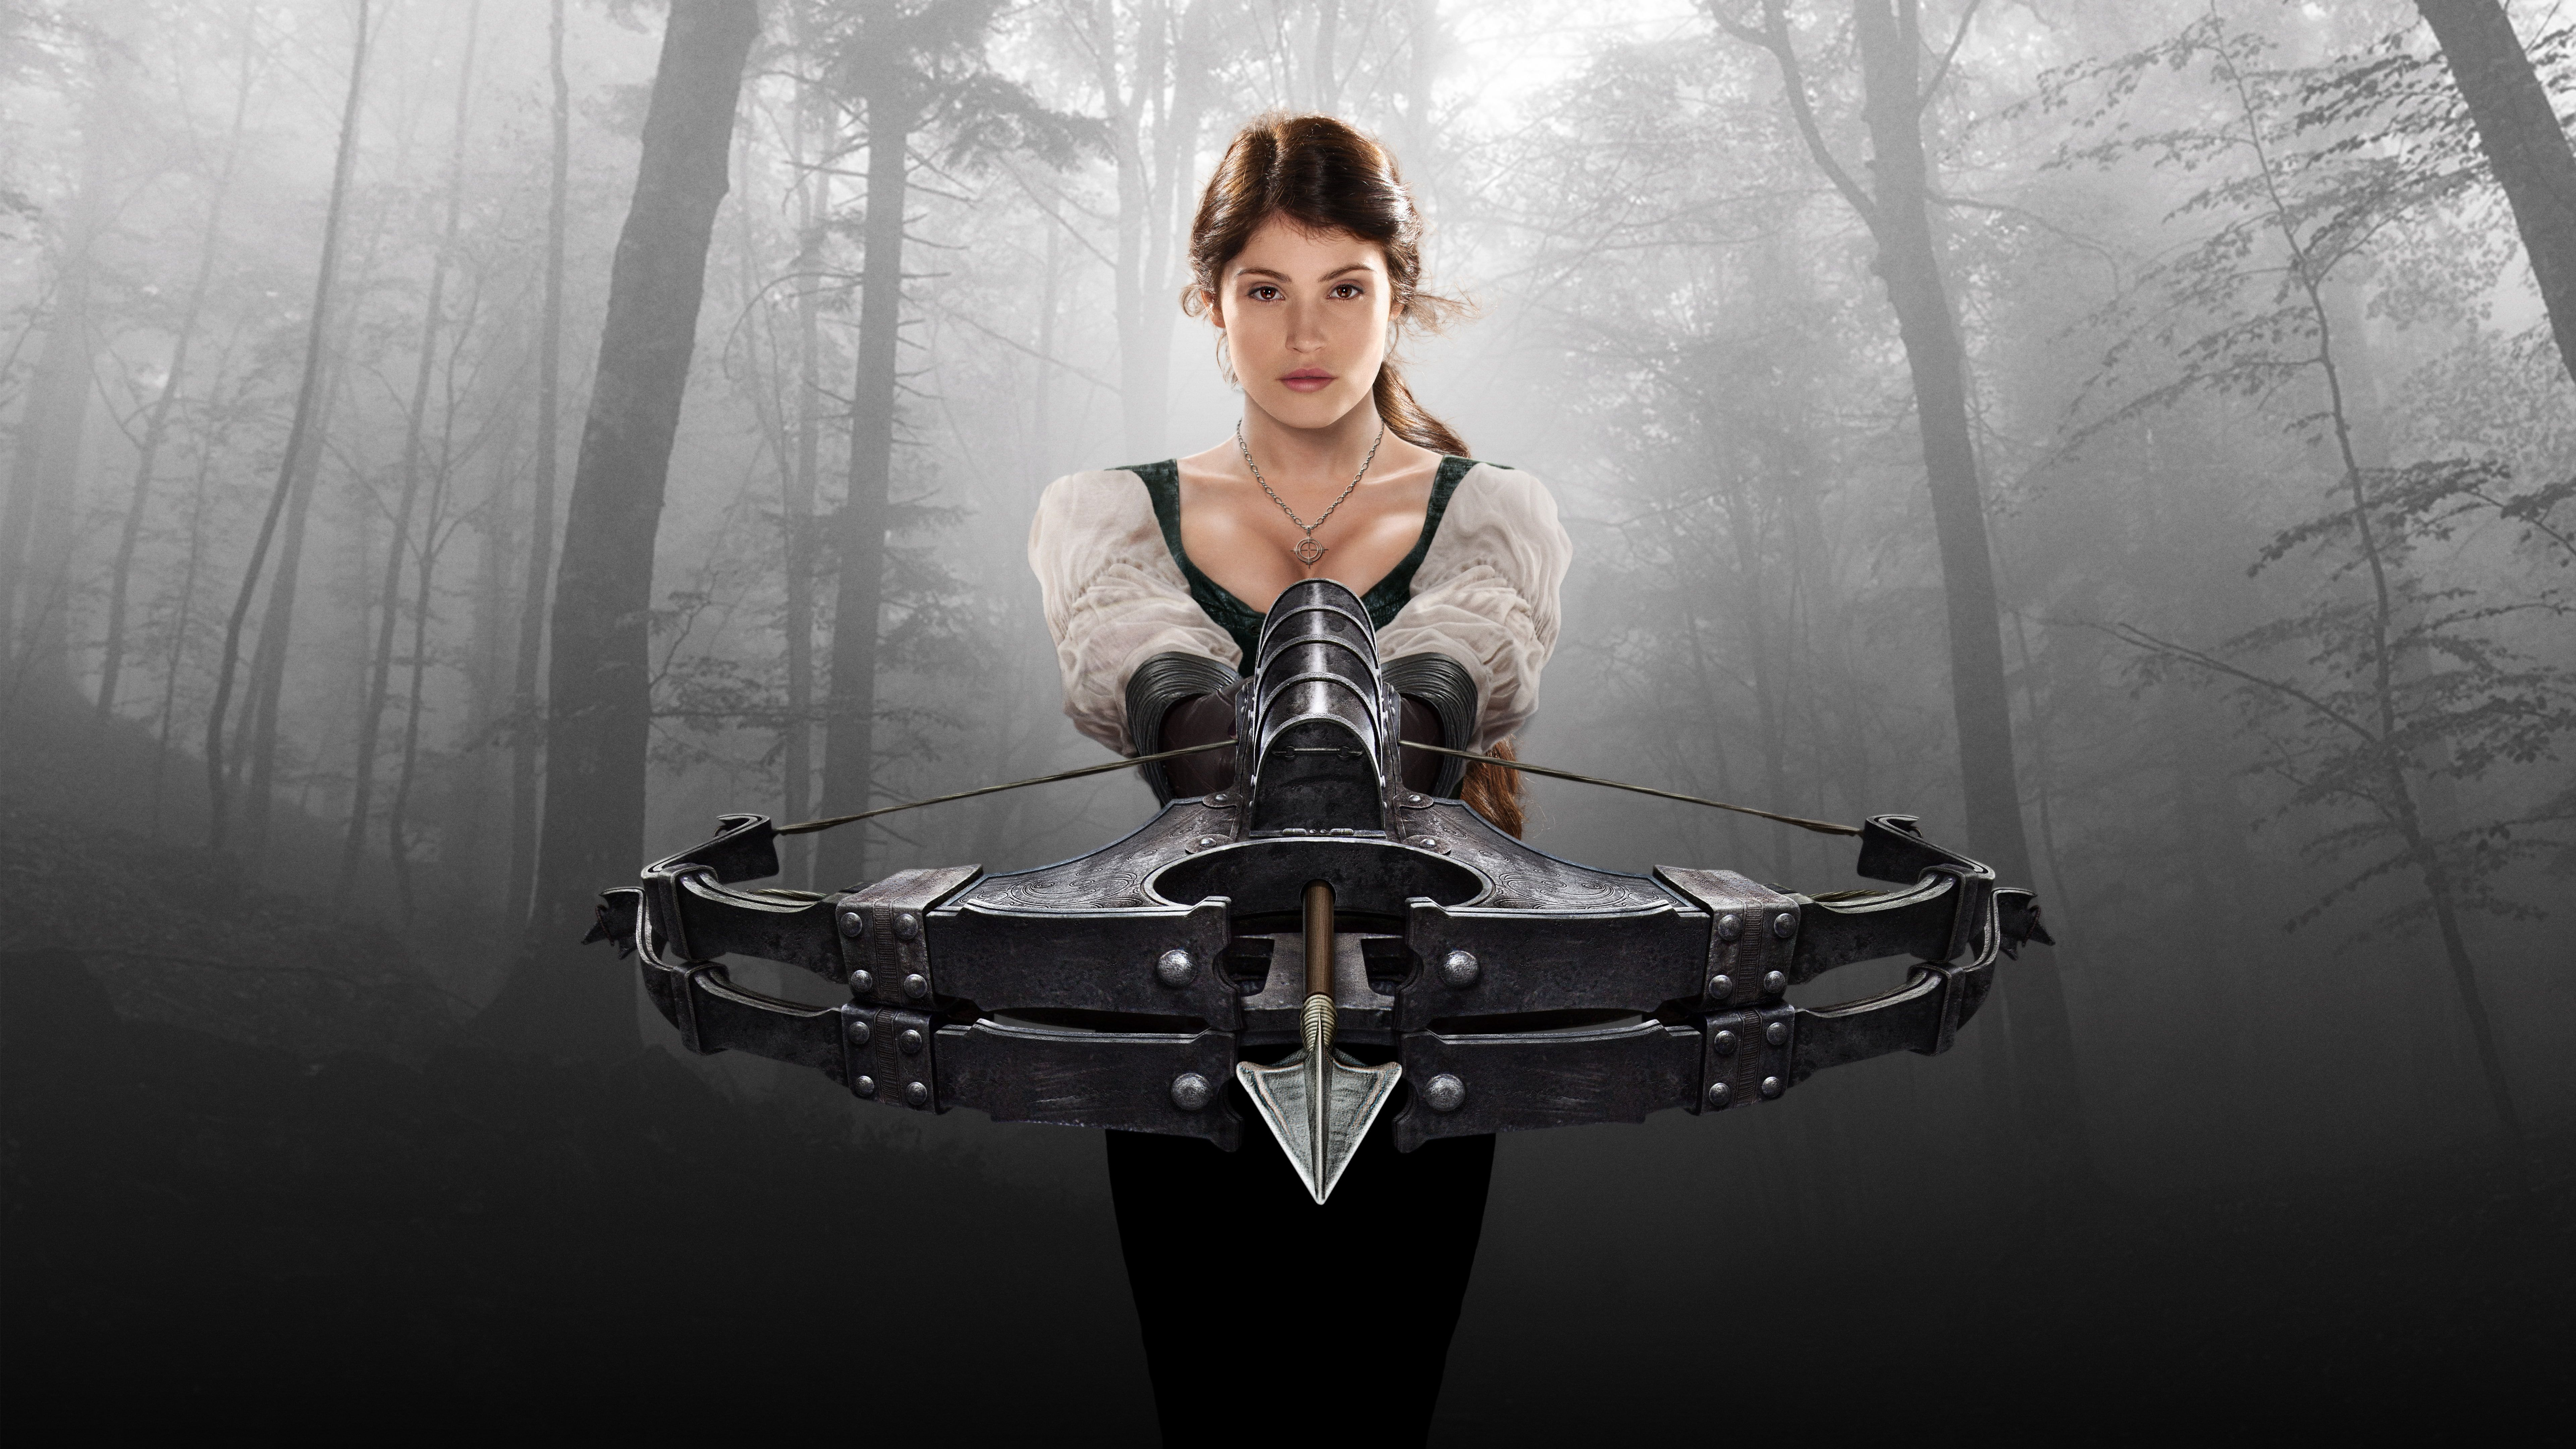 HD wallpaper: 8K, Hansel and Gretel: Witch Hunters, 4K, Gemma Arterton, one person